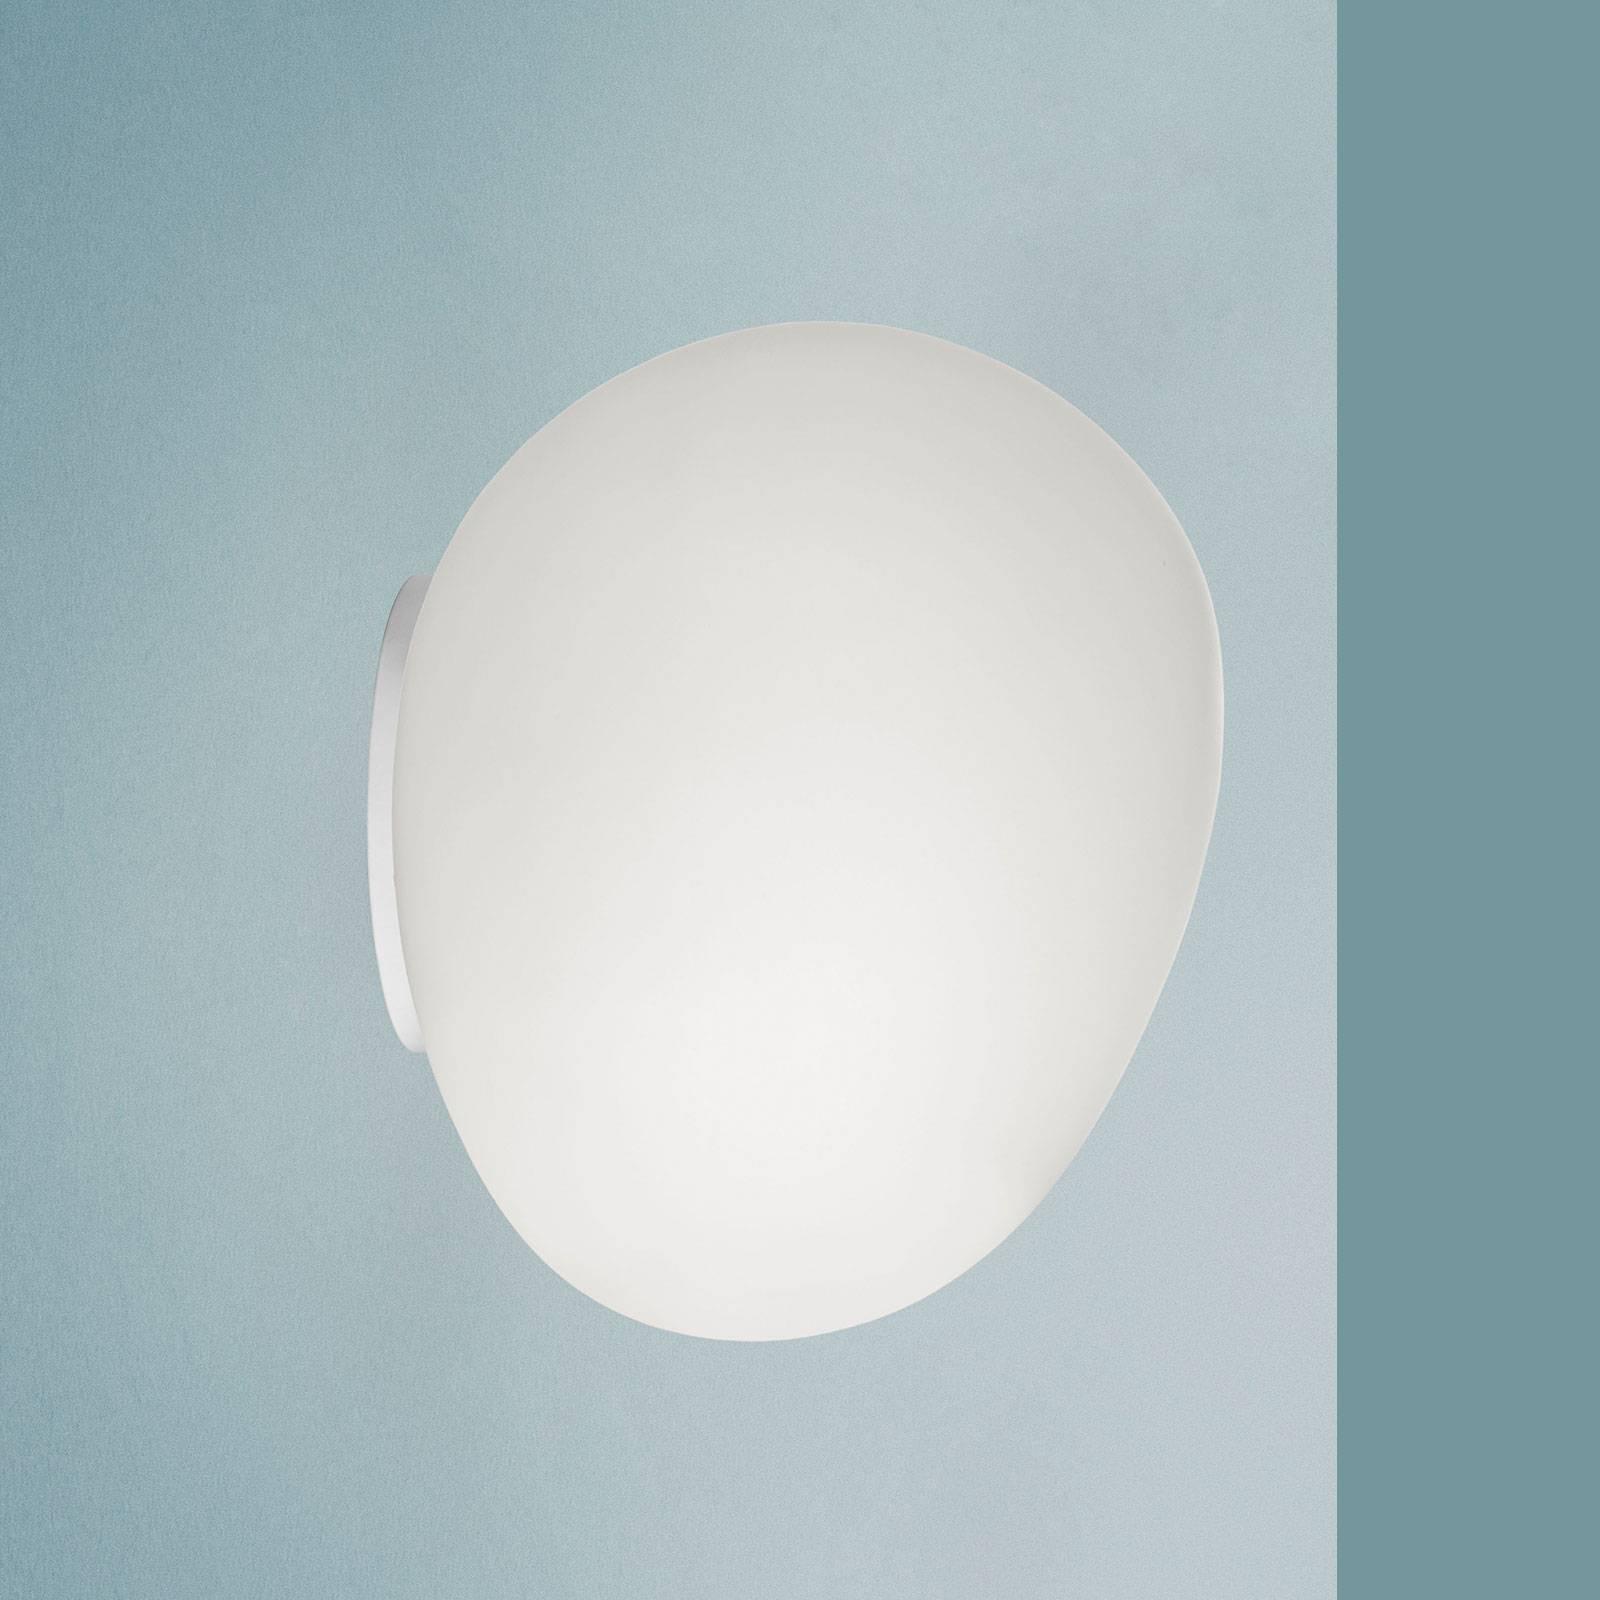 Foscarini Gregg MIDI LED-Außenwandleuchte